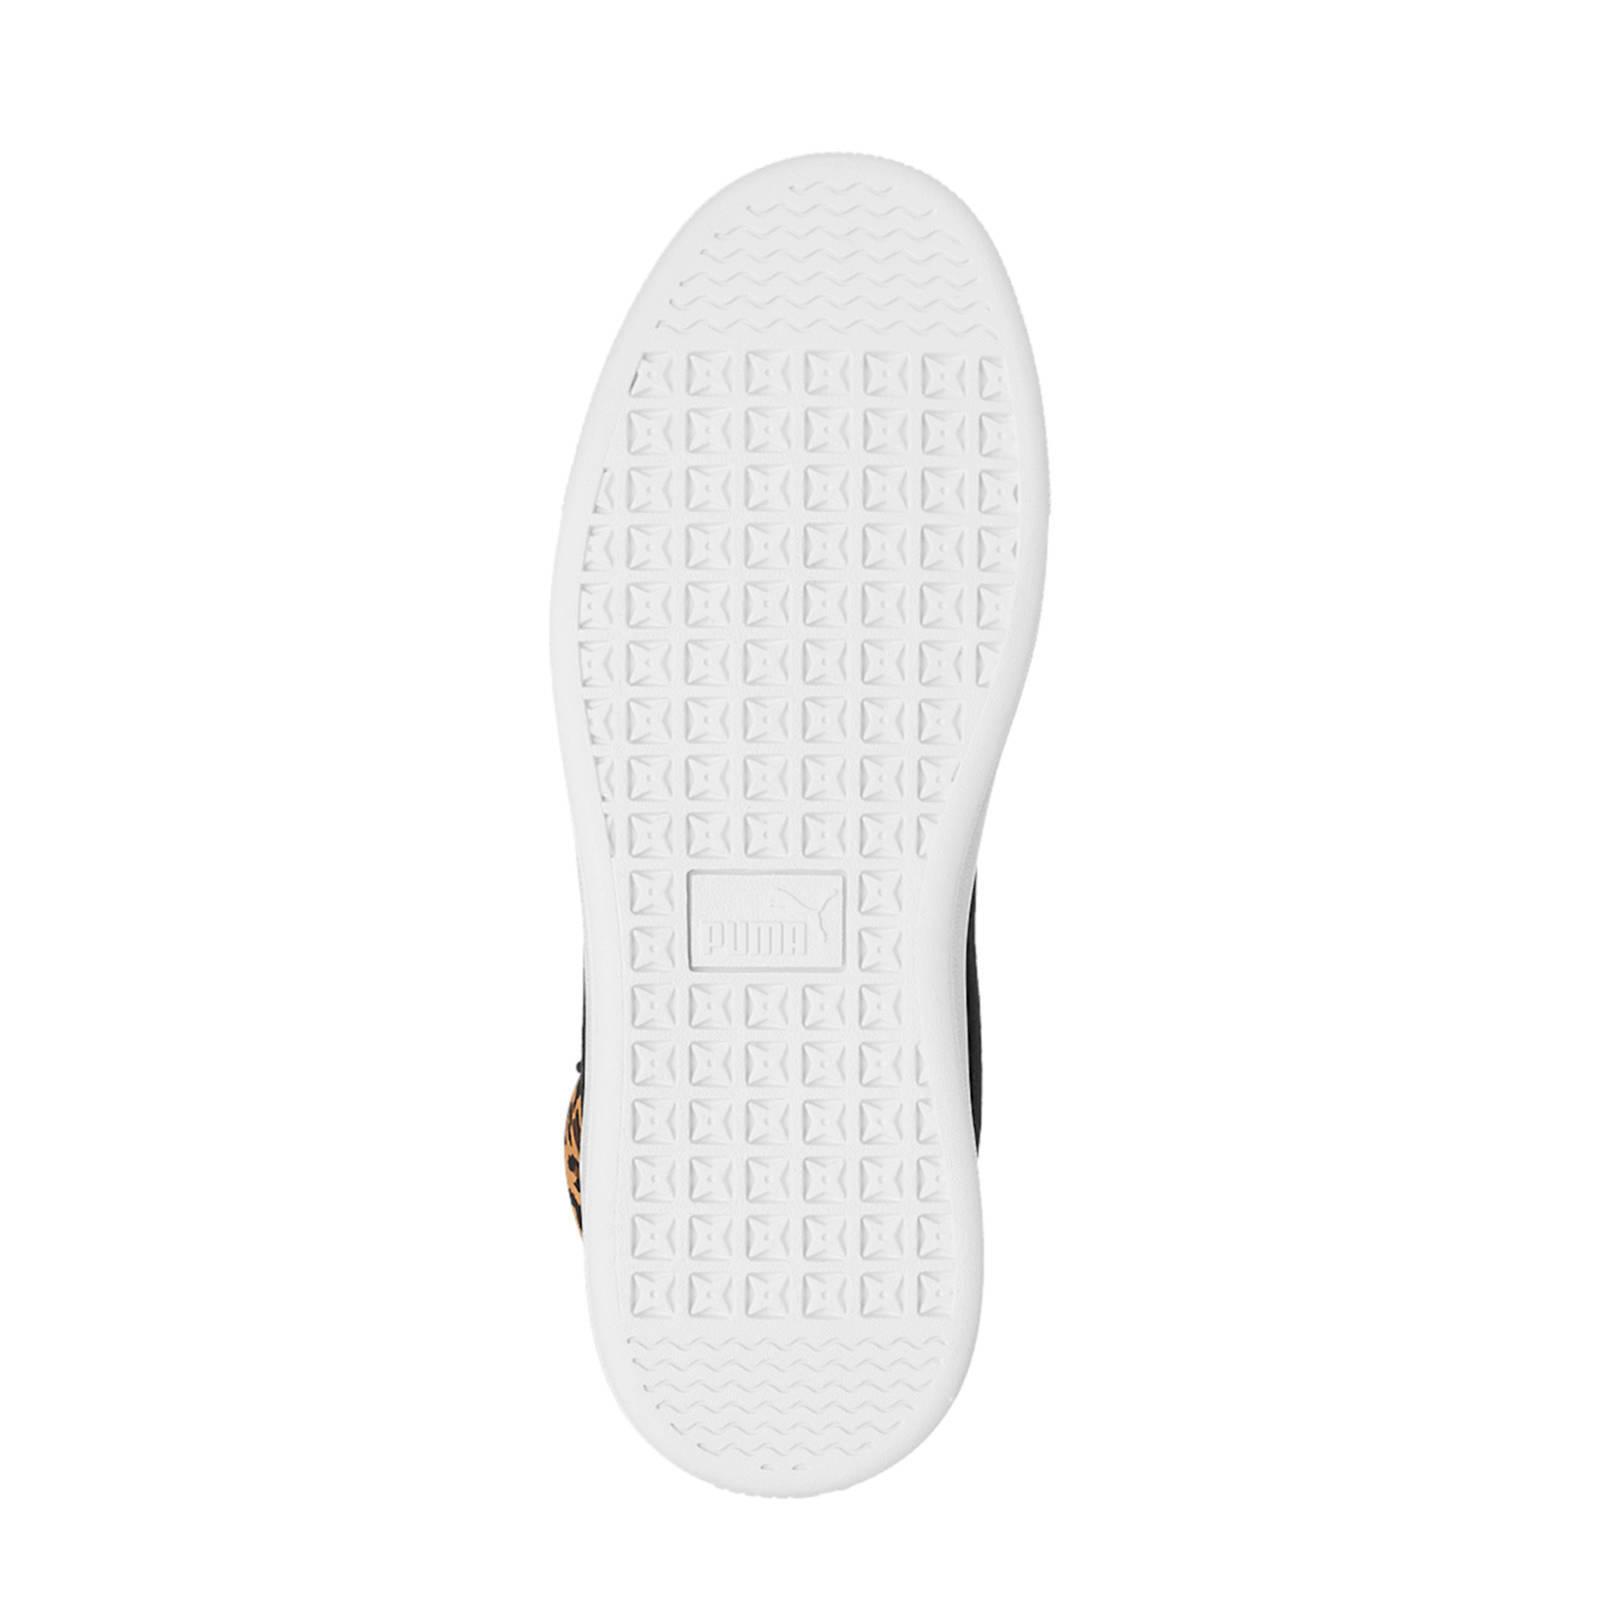 Puma Vikky Mid hoge sneakers zwartpanterprint   wehkamp